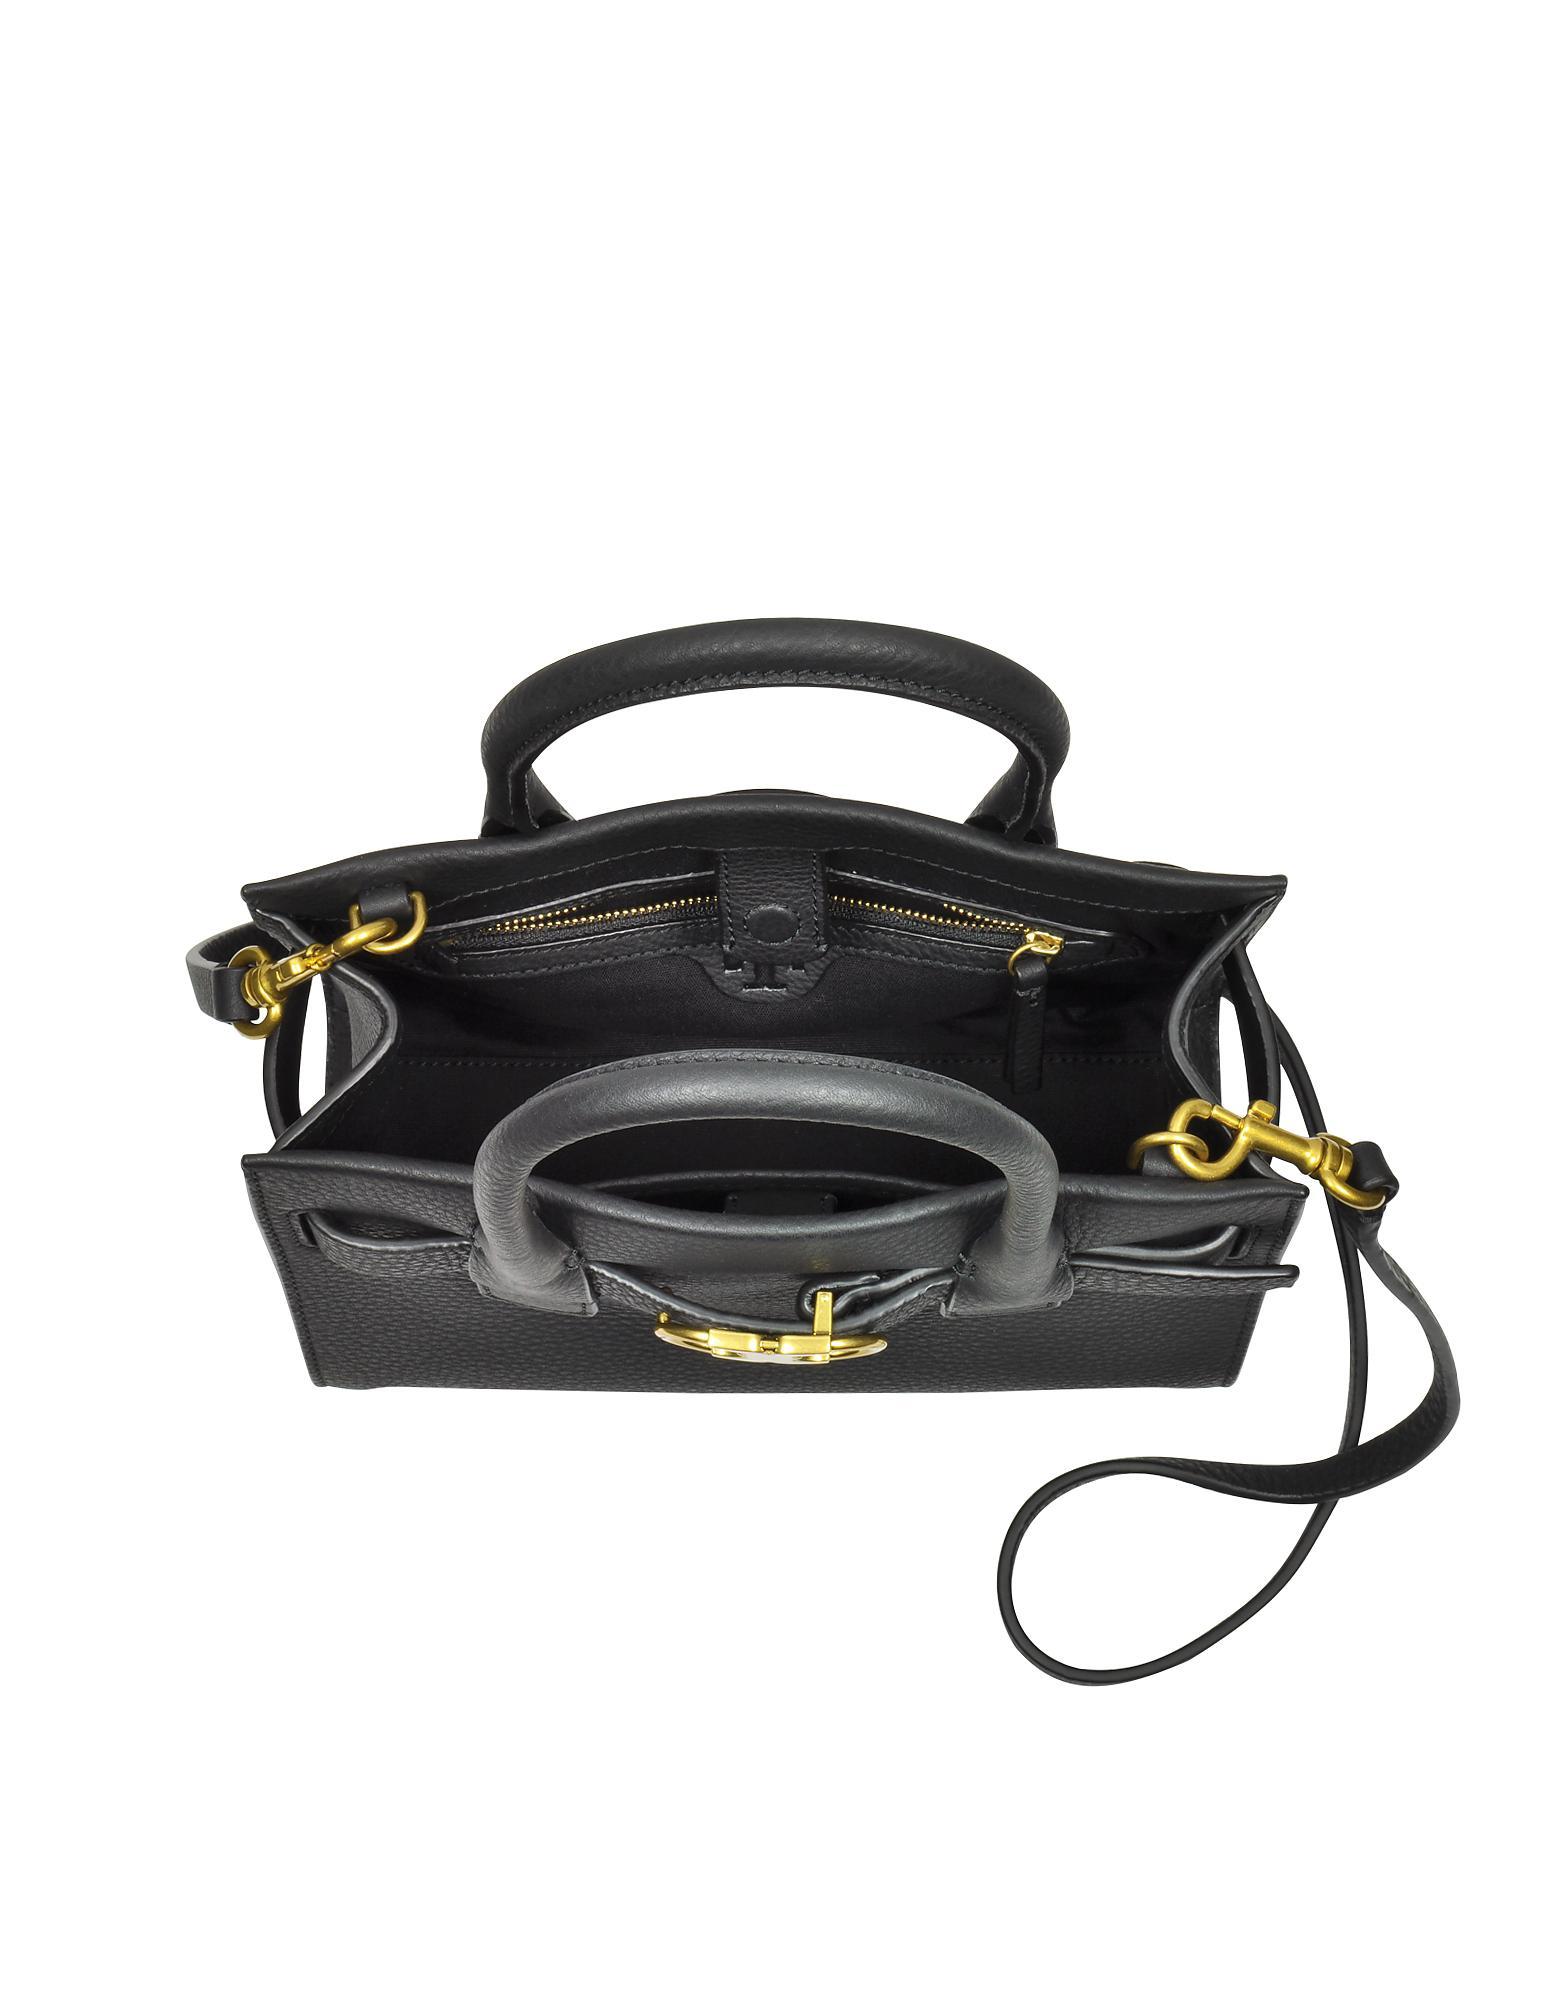 efeca677df8d Tory Burch Gemini Link Black Leather Small Tote Bag in Black - Lyst